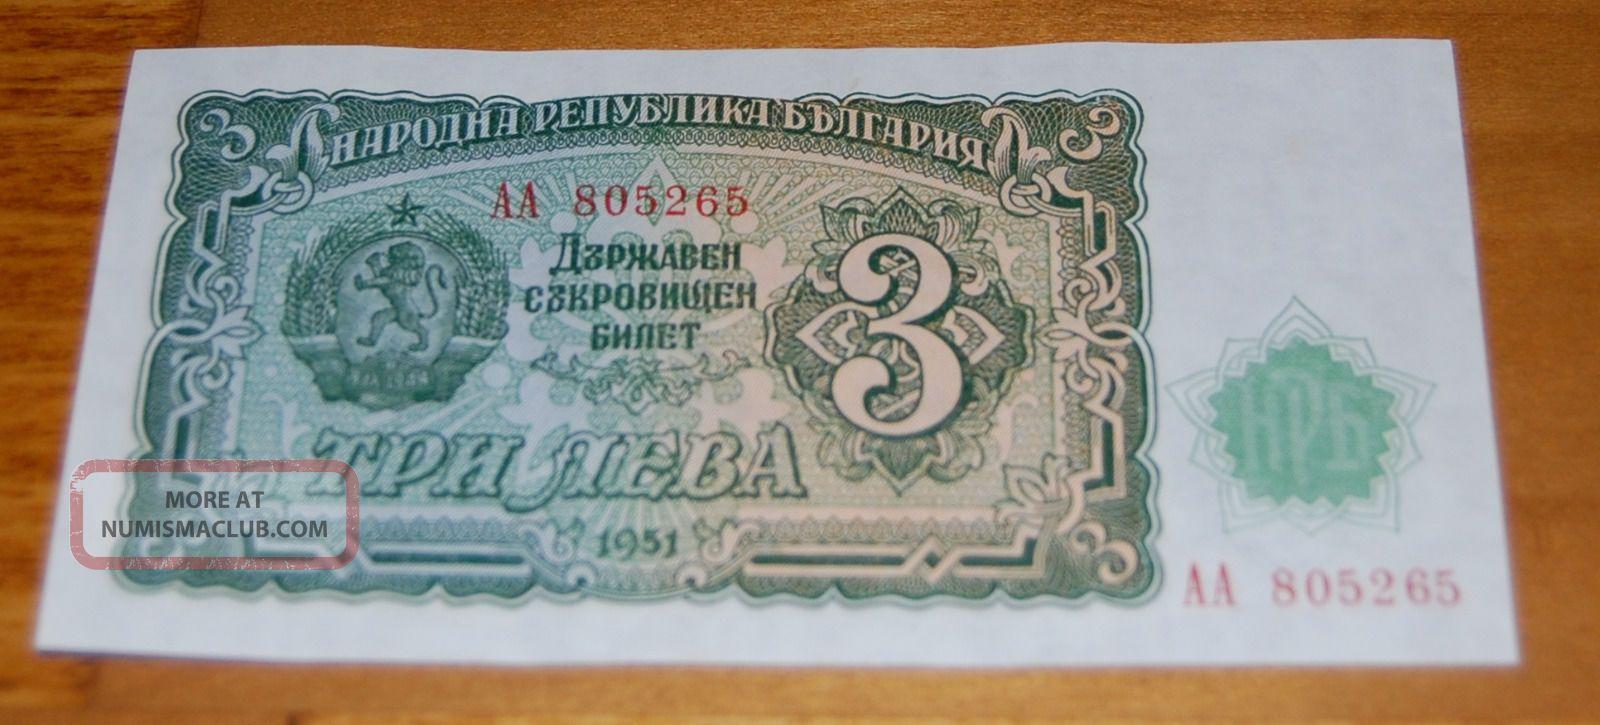 Bulgaria 3 Bulgarian Leva 1951 Banknote Paper Money Uncirculated Unc Europe photo